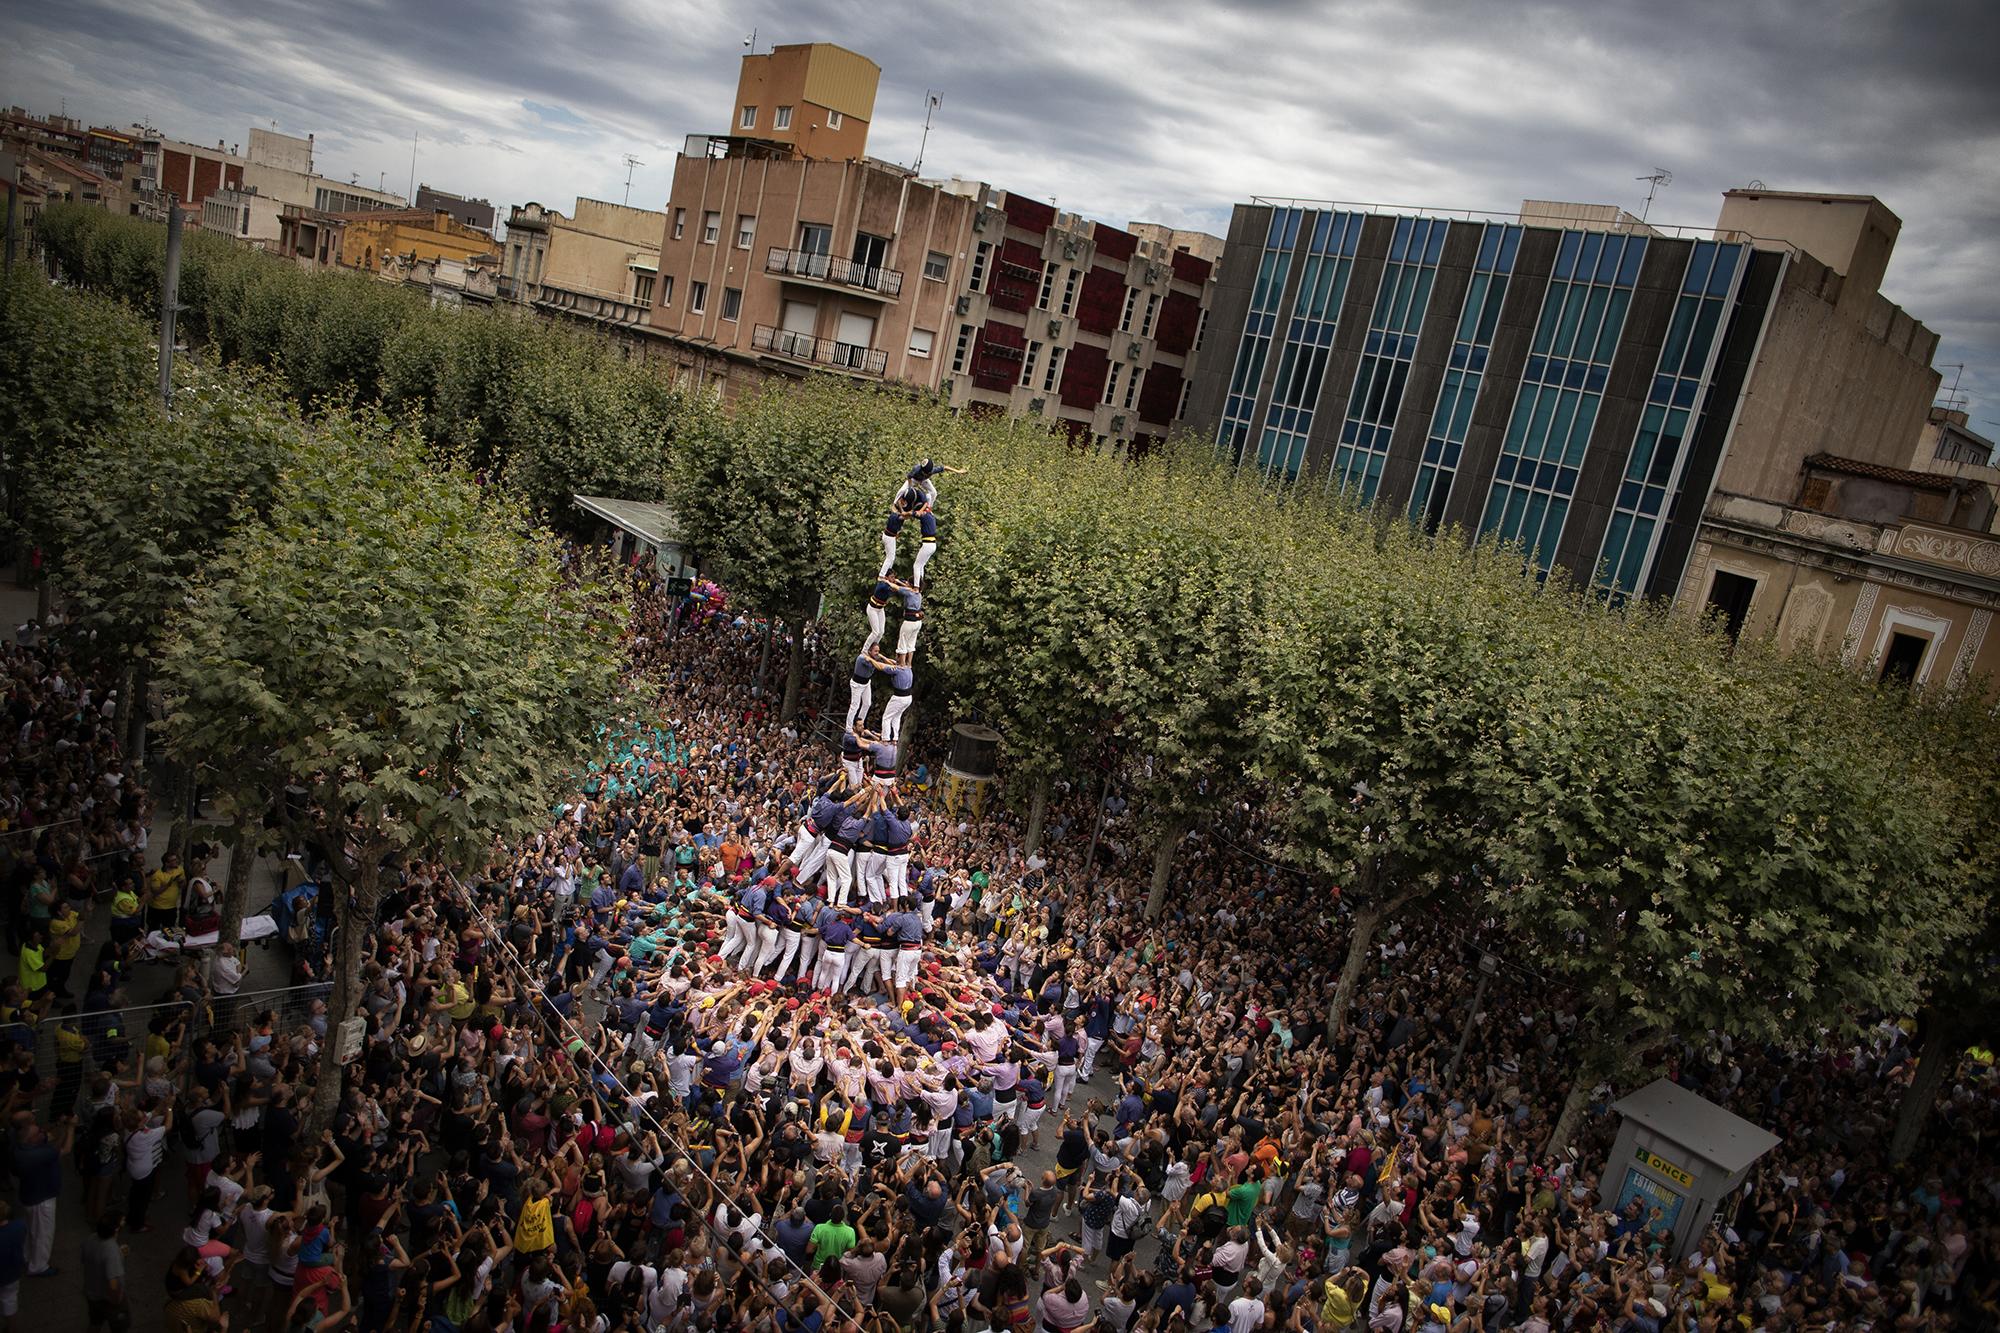 Lux - Les Santes | Manel Quiros Photography